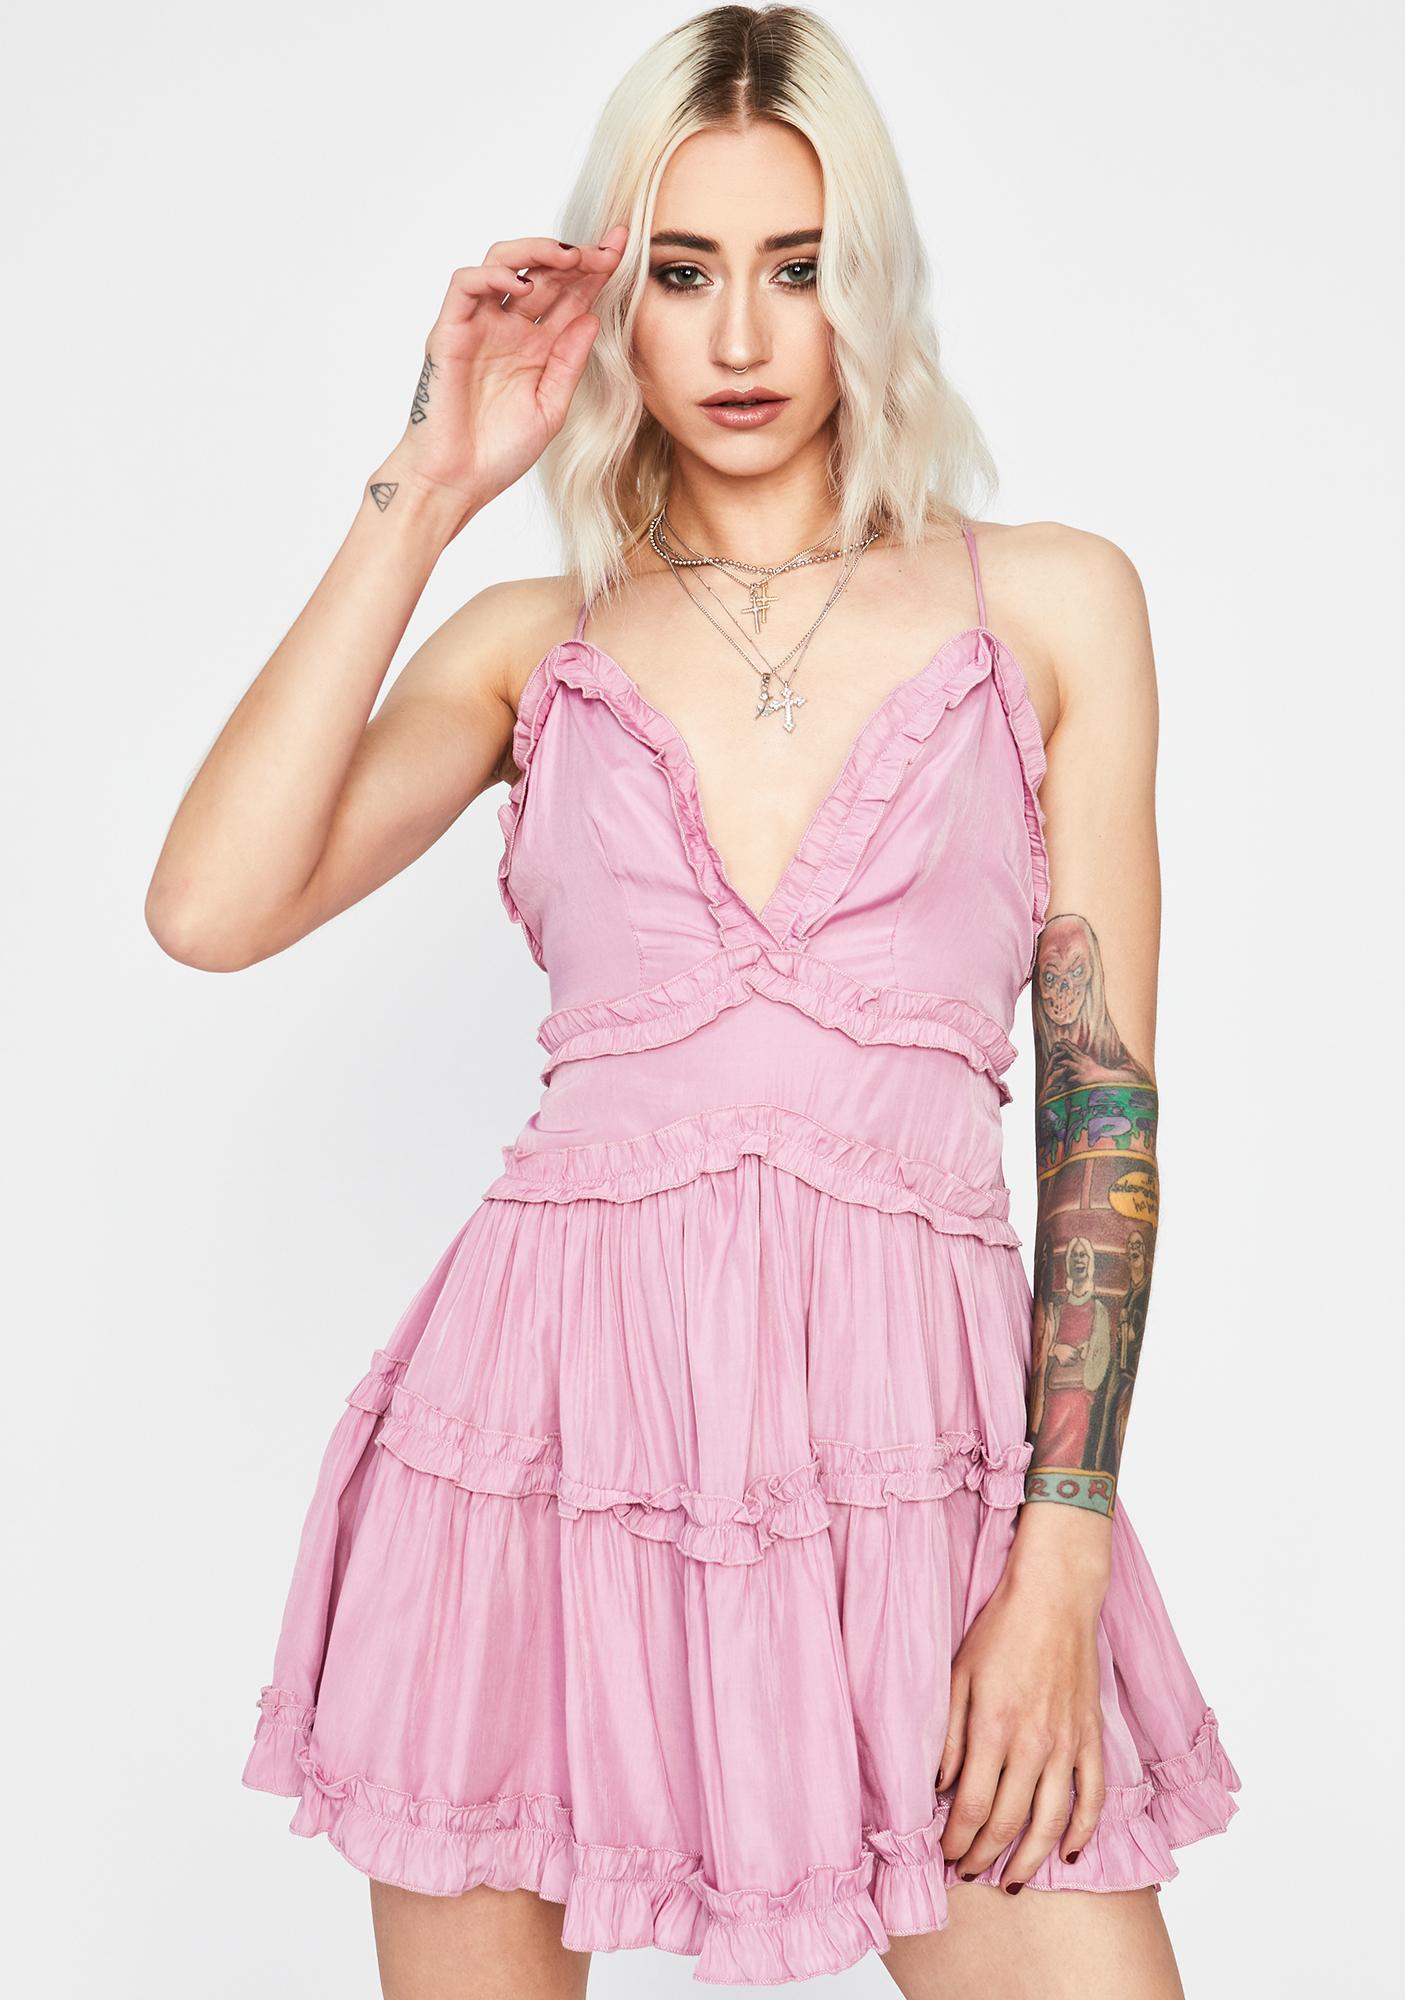 BB Ruffle Me Up Mini Dress